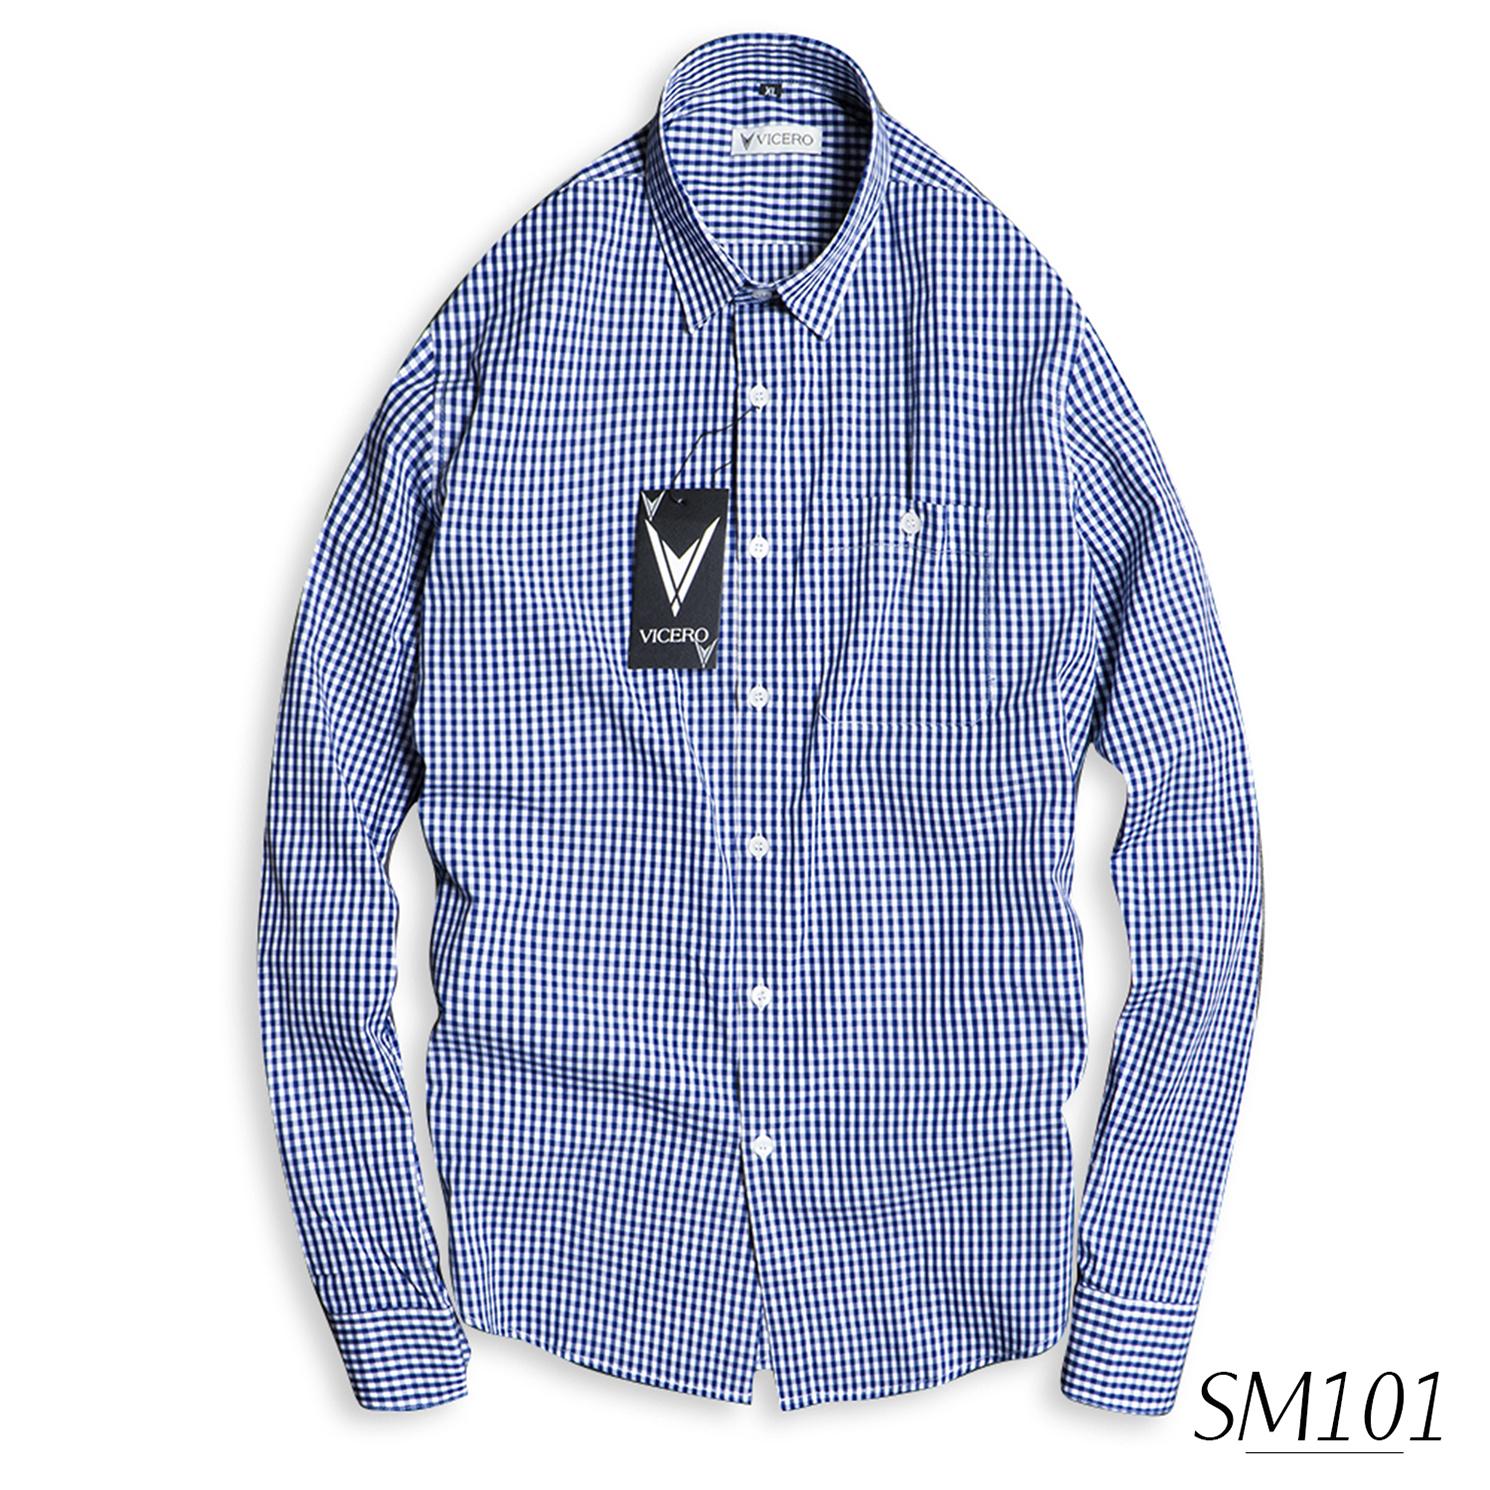 Áo Sơ Mi Nam Kẻ Caro Vải Cotton Thời Trang Vicero